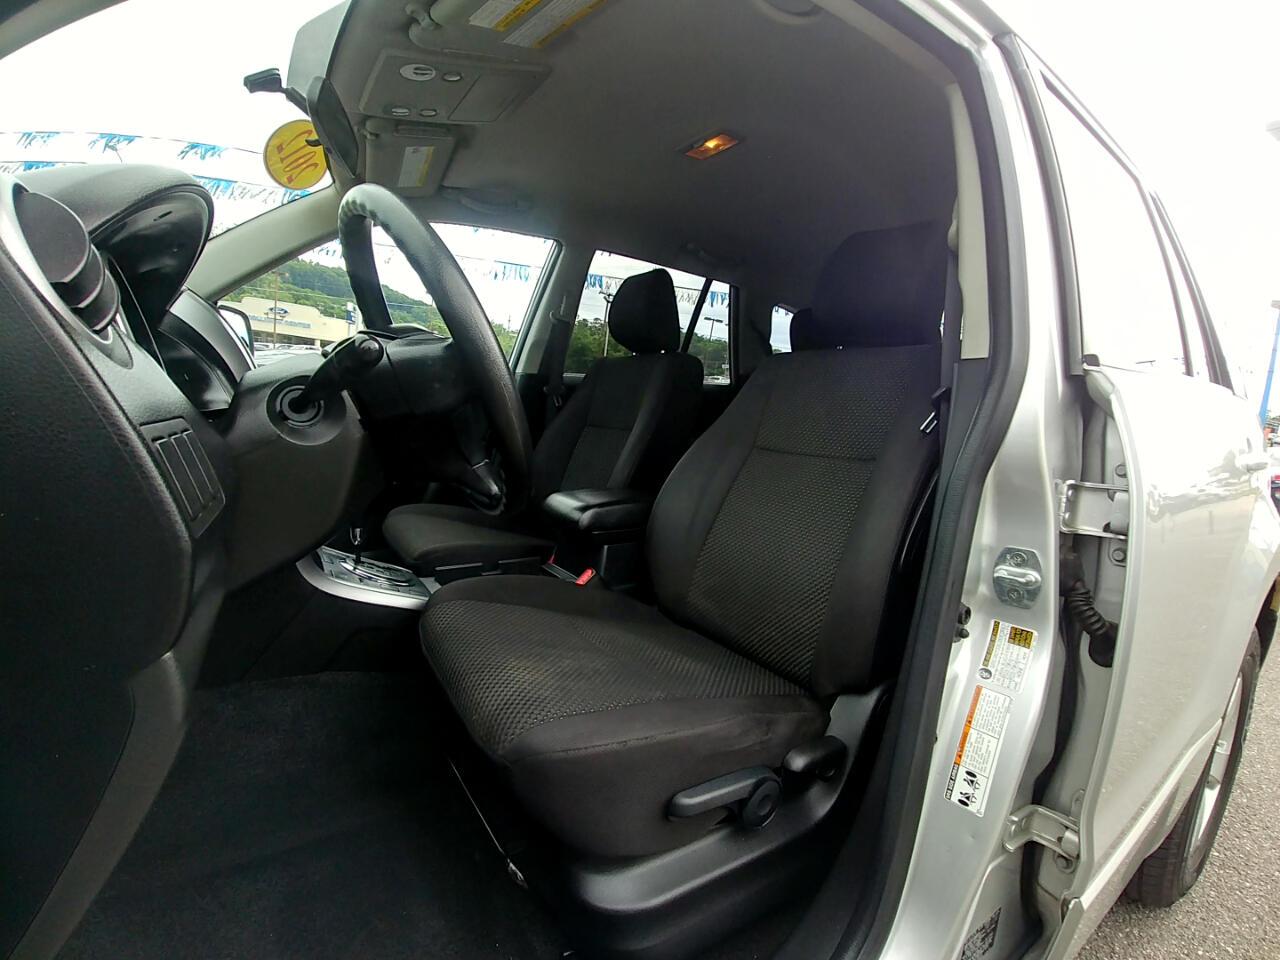 Suzuki Grand Vitara 4WD 4dr Auto Premium 2012